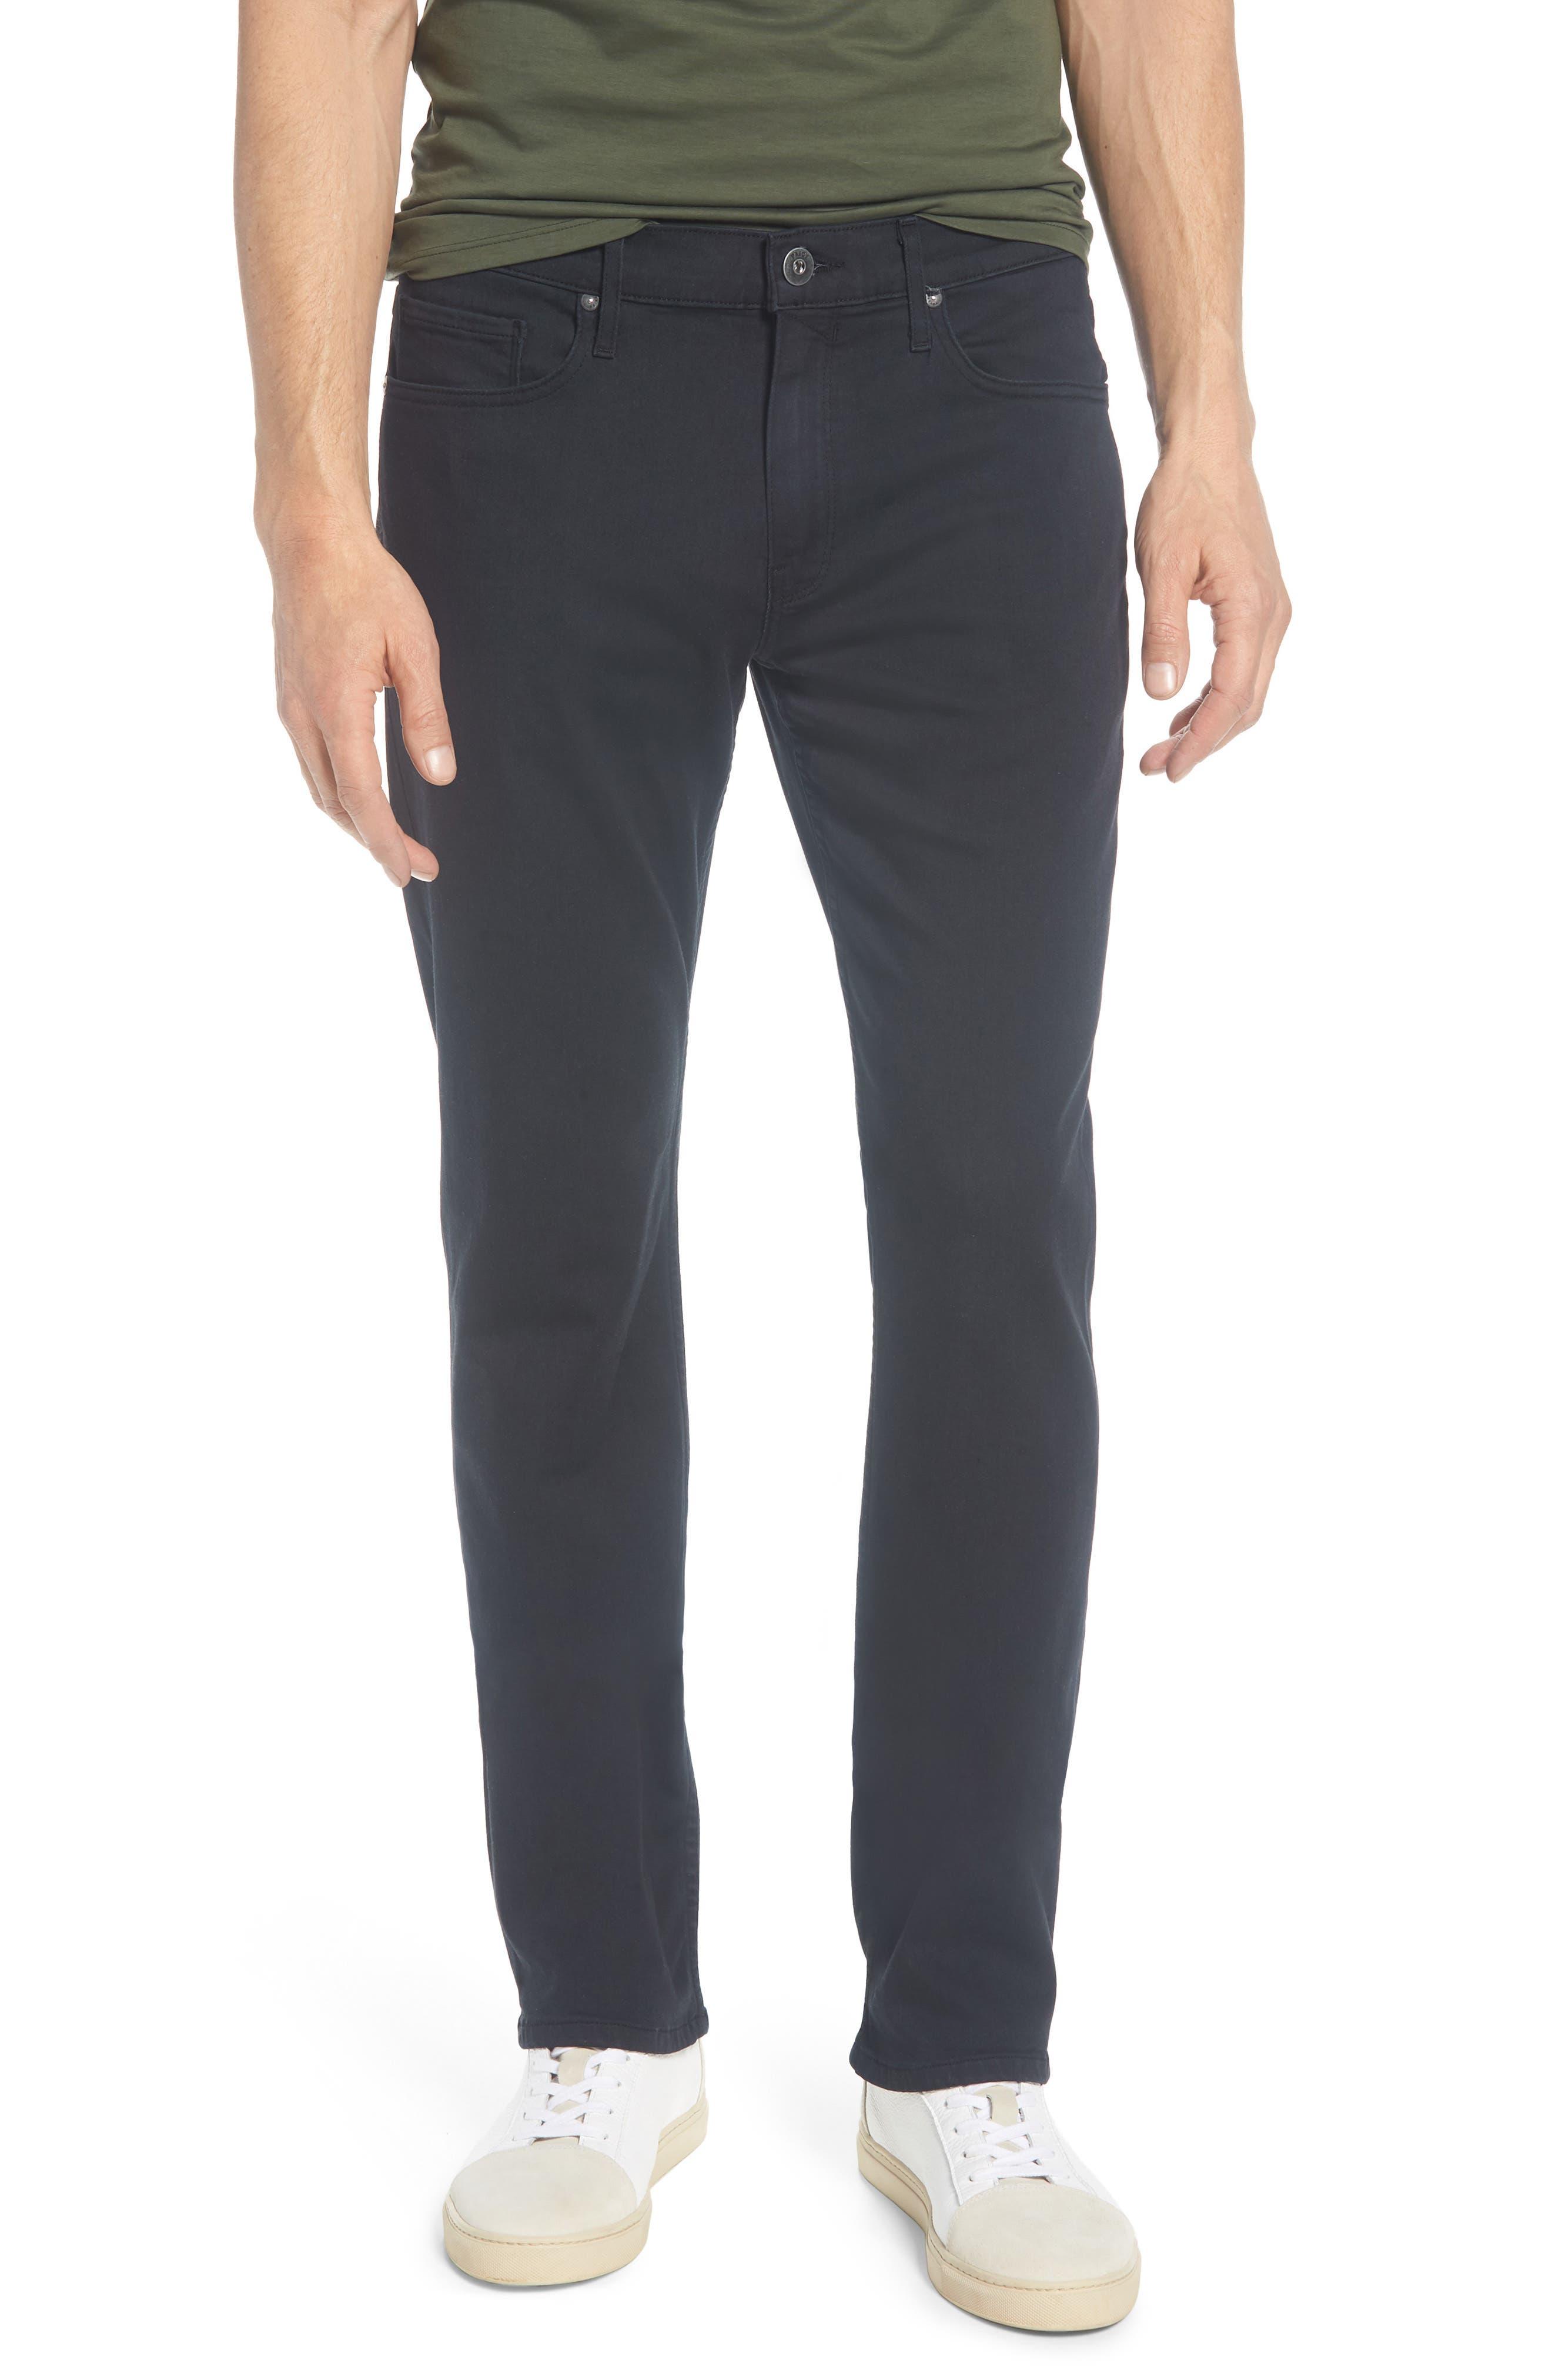 Normandie Straight Leg Jeans,                         Main,                         color, 400